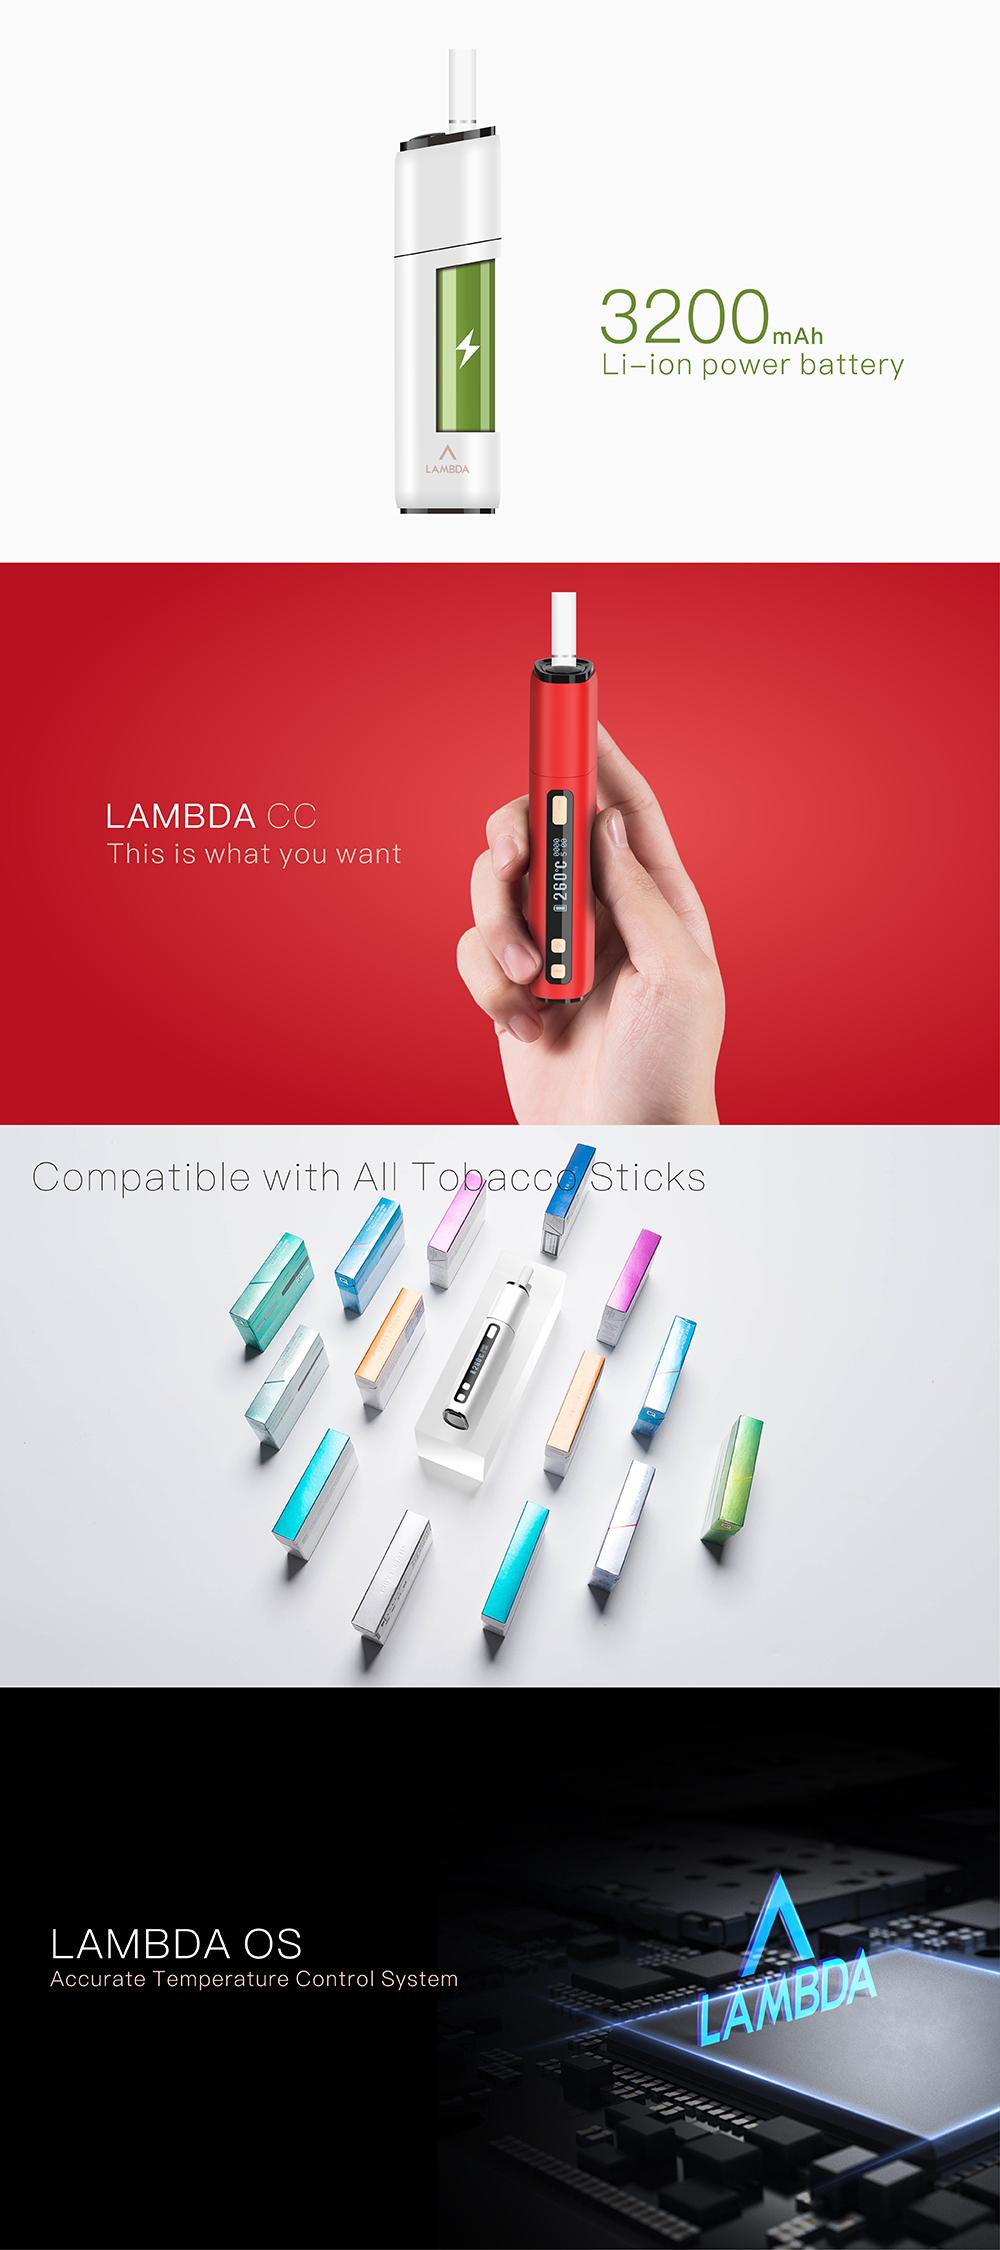 (Red) LAMBDA CC OLED HD Display